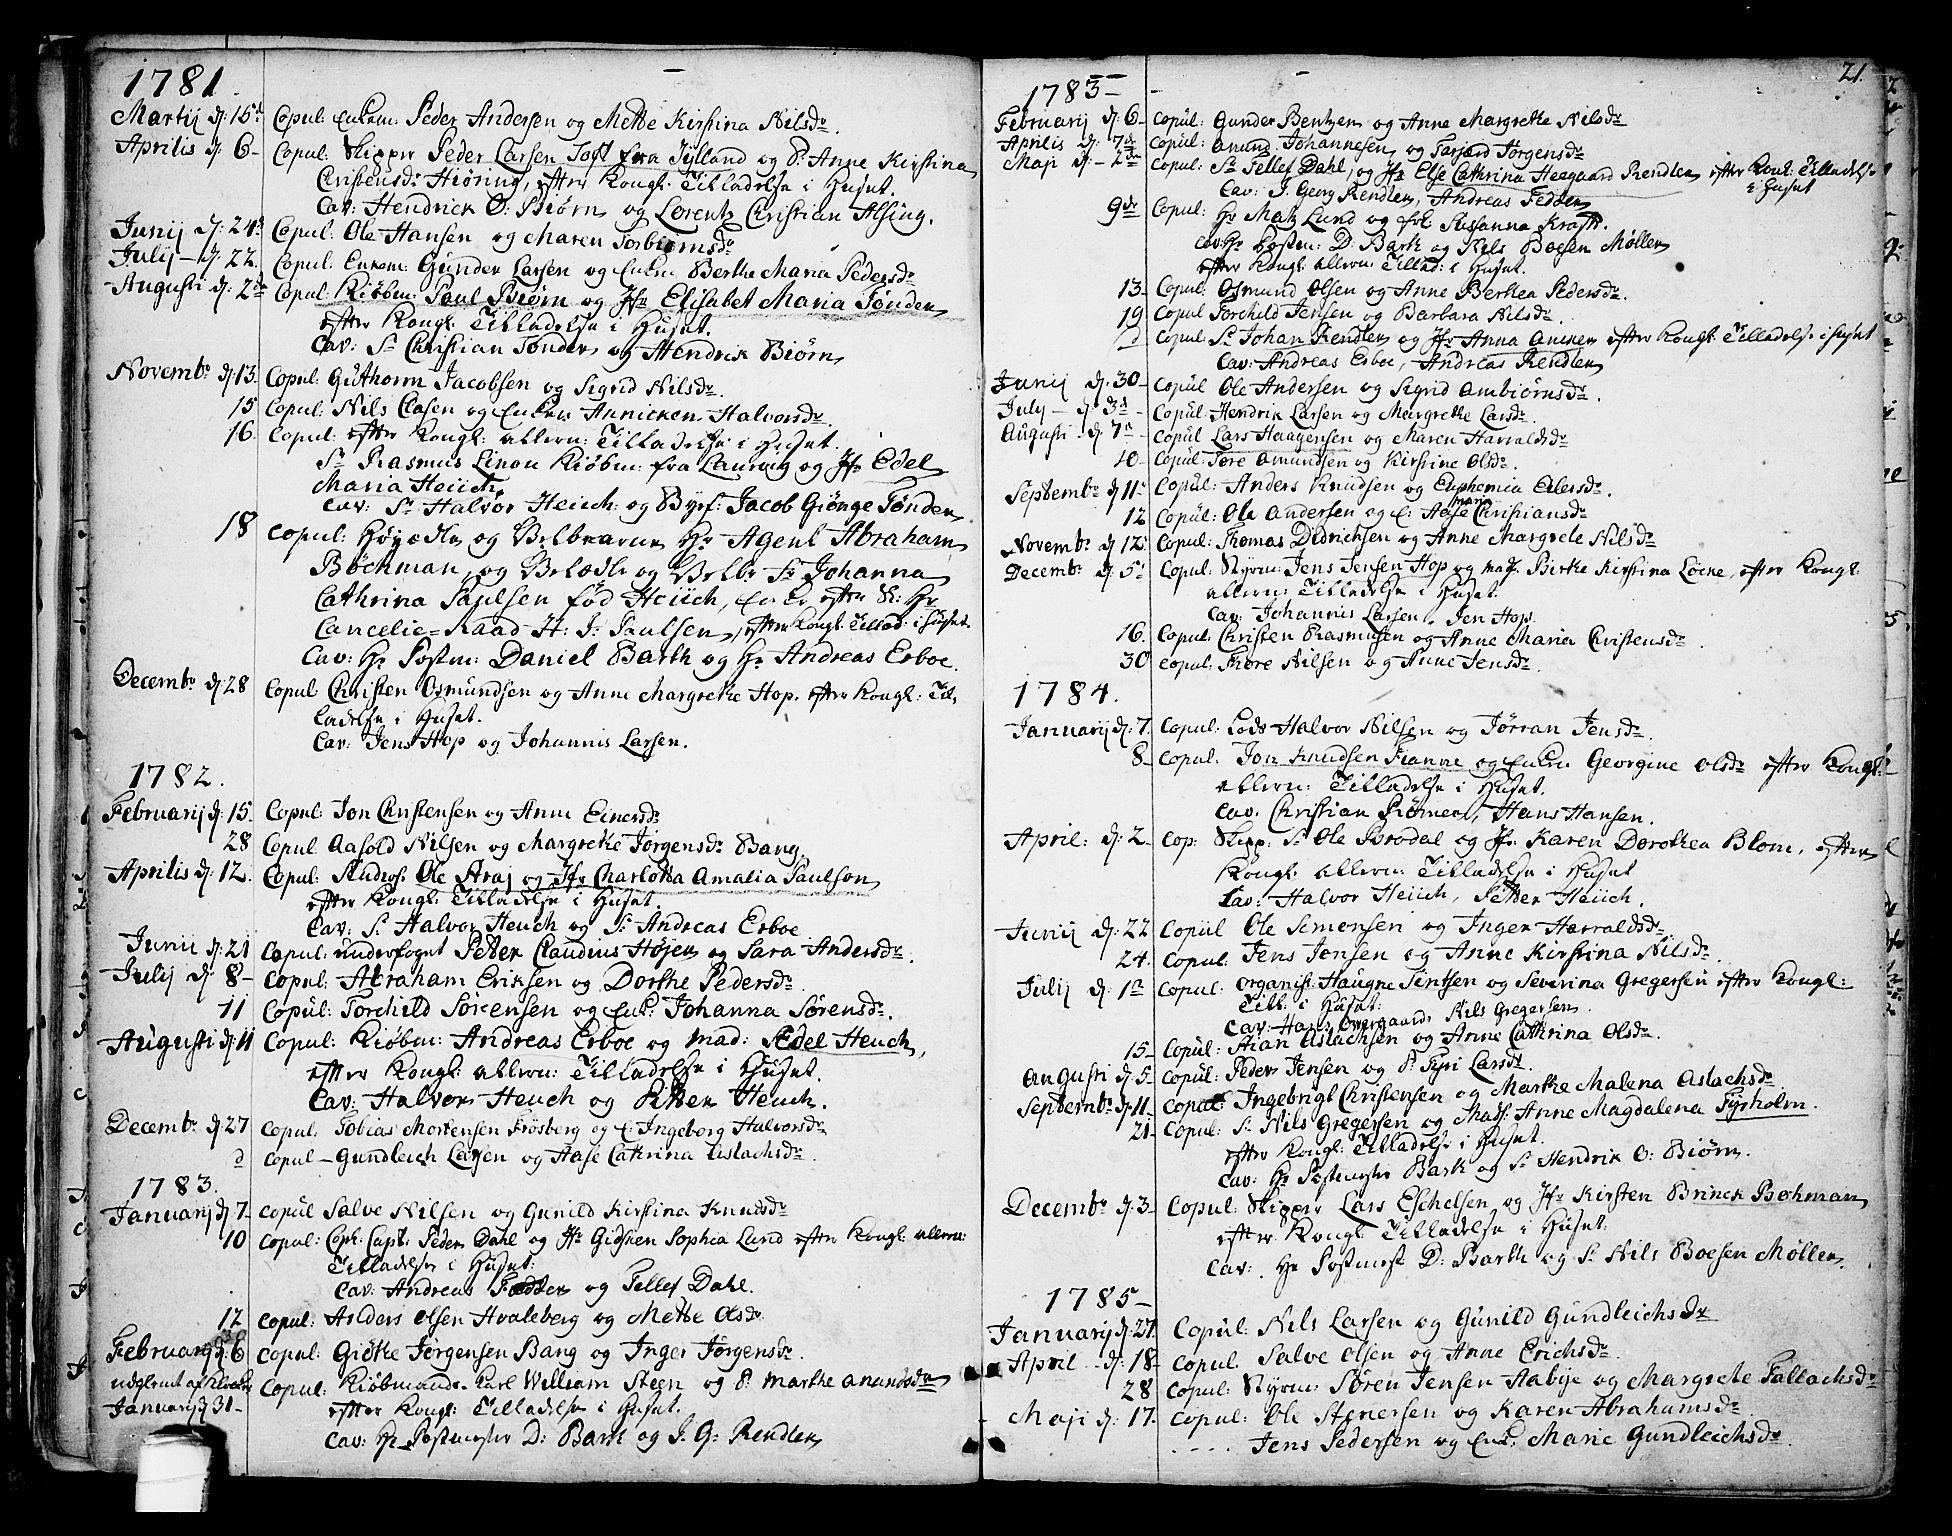 SAKO, Kragerø kirkebøker, F/Fa/L0002: Ministerialbok nr. 2, 1767-1802, s. 21